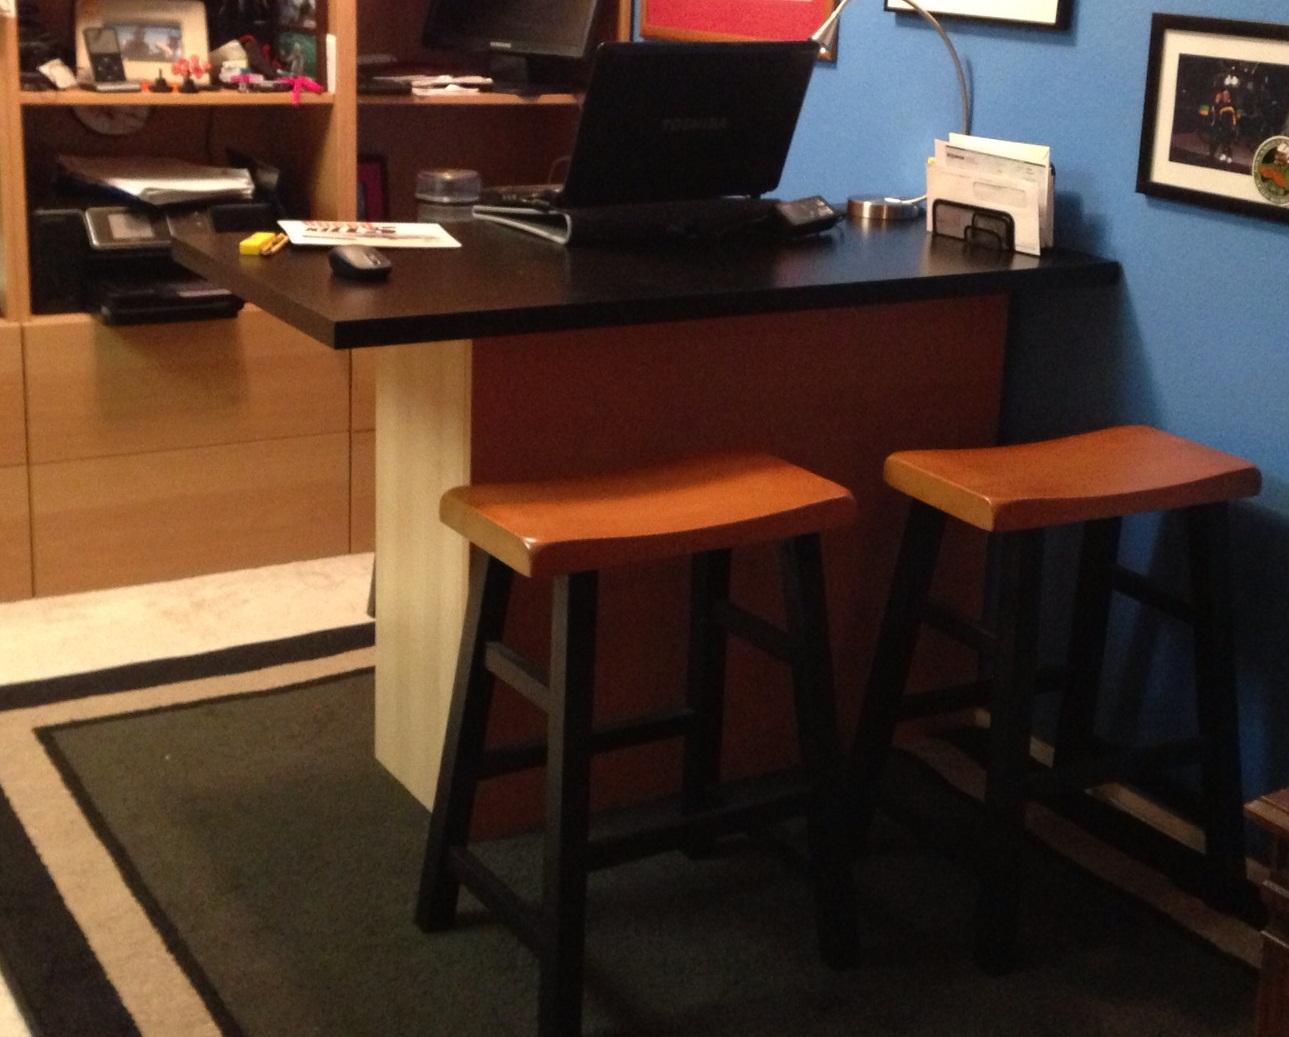 breakfast barhome office desk kitchen bar table Breakfast bar home office desk